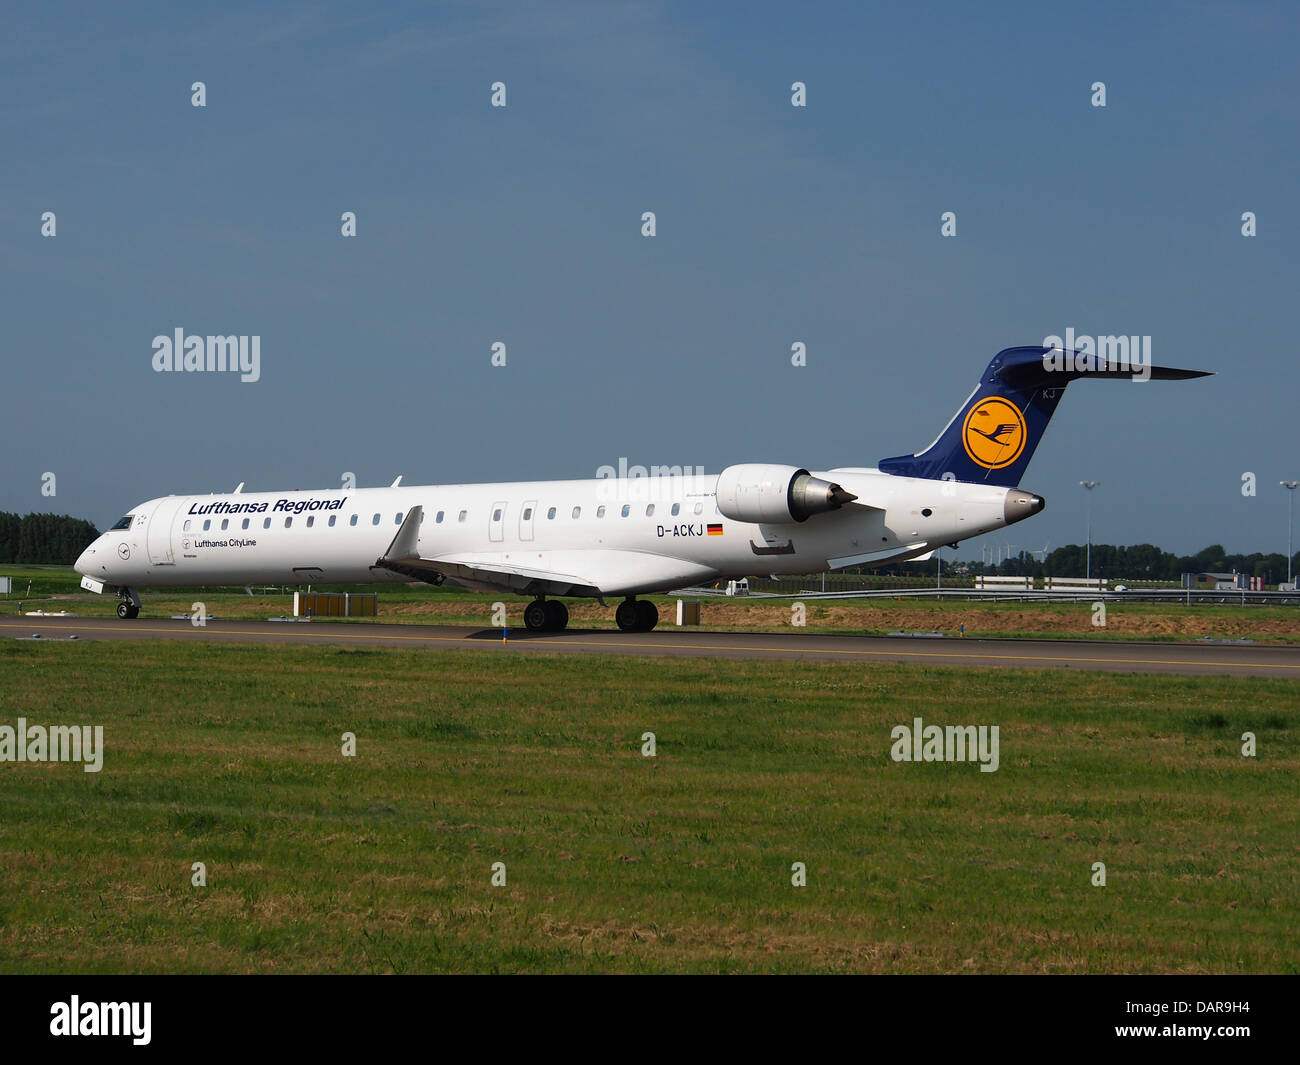 D-ACKJ Lufthansa CityLine Canadair CL-600-2D24 Regional Jet 3 - Stock Image